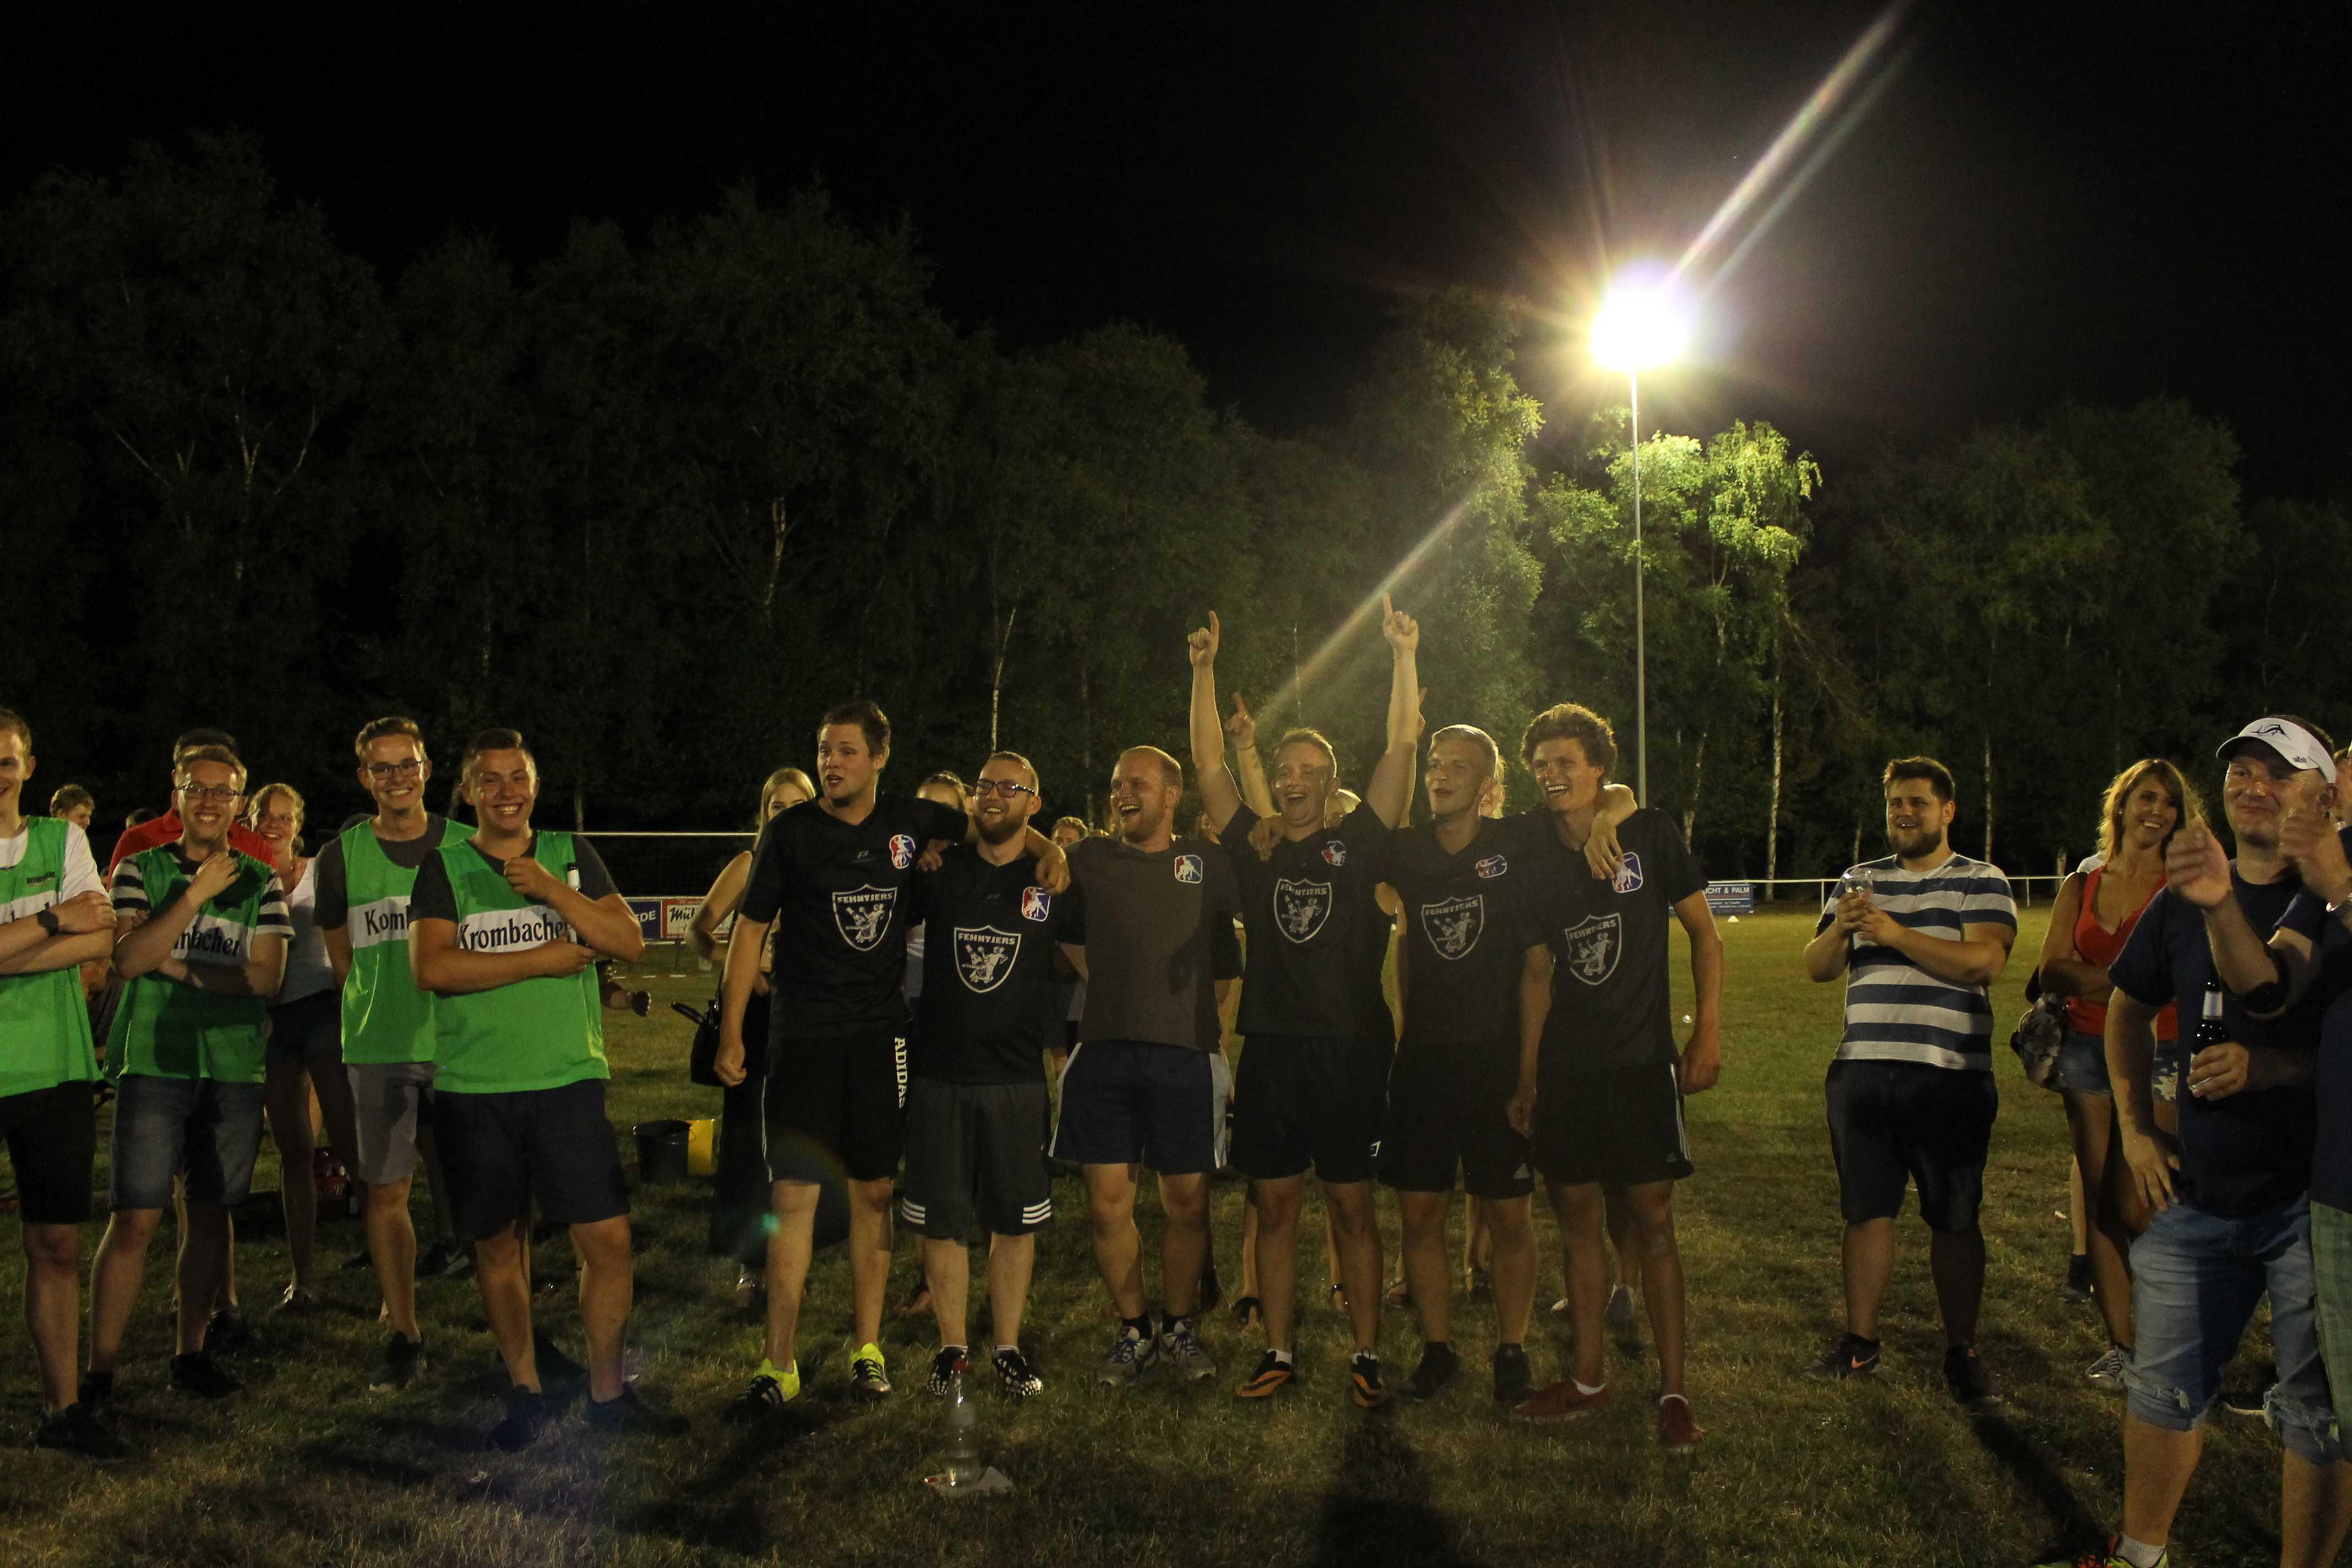 2018-07-27 Sportwoche - Flunkyball Turnier (95)